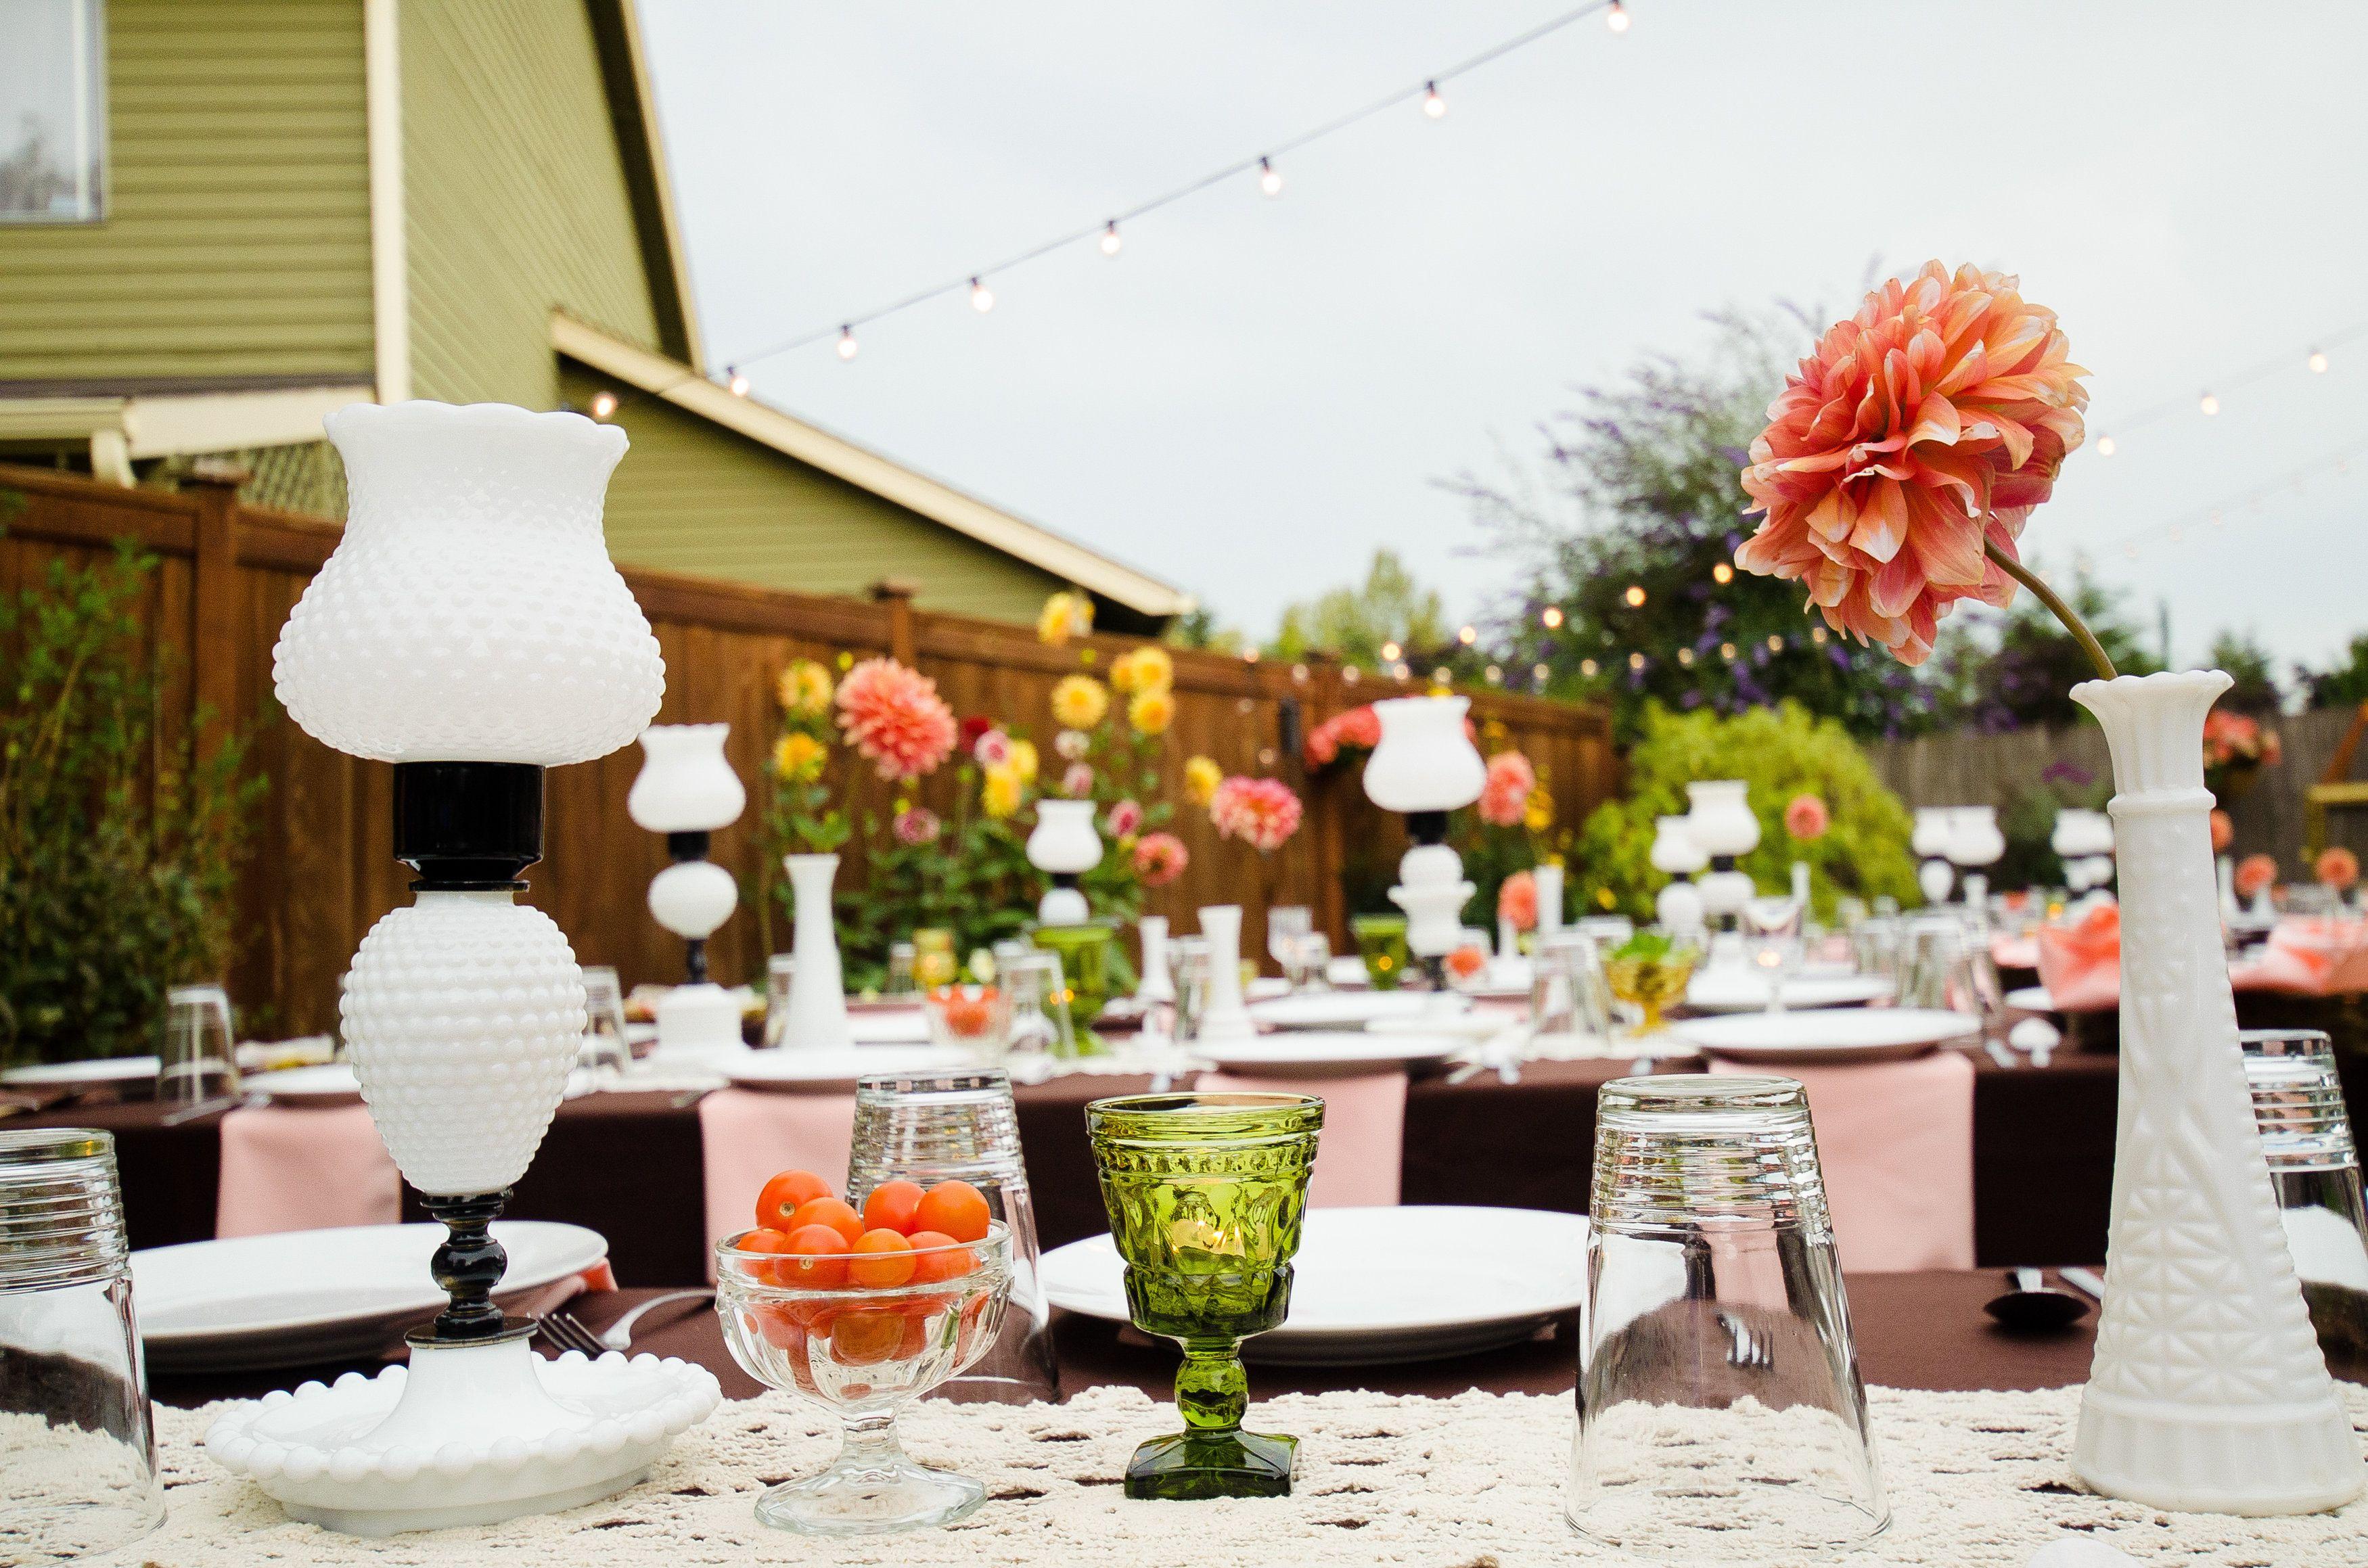 backyard wedding   Backyard wedding, Fun wedding, Diy wedding